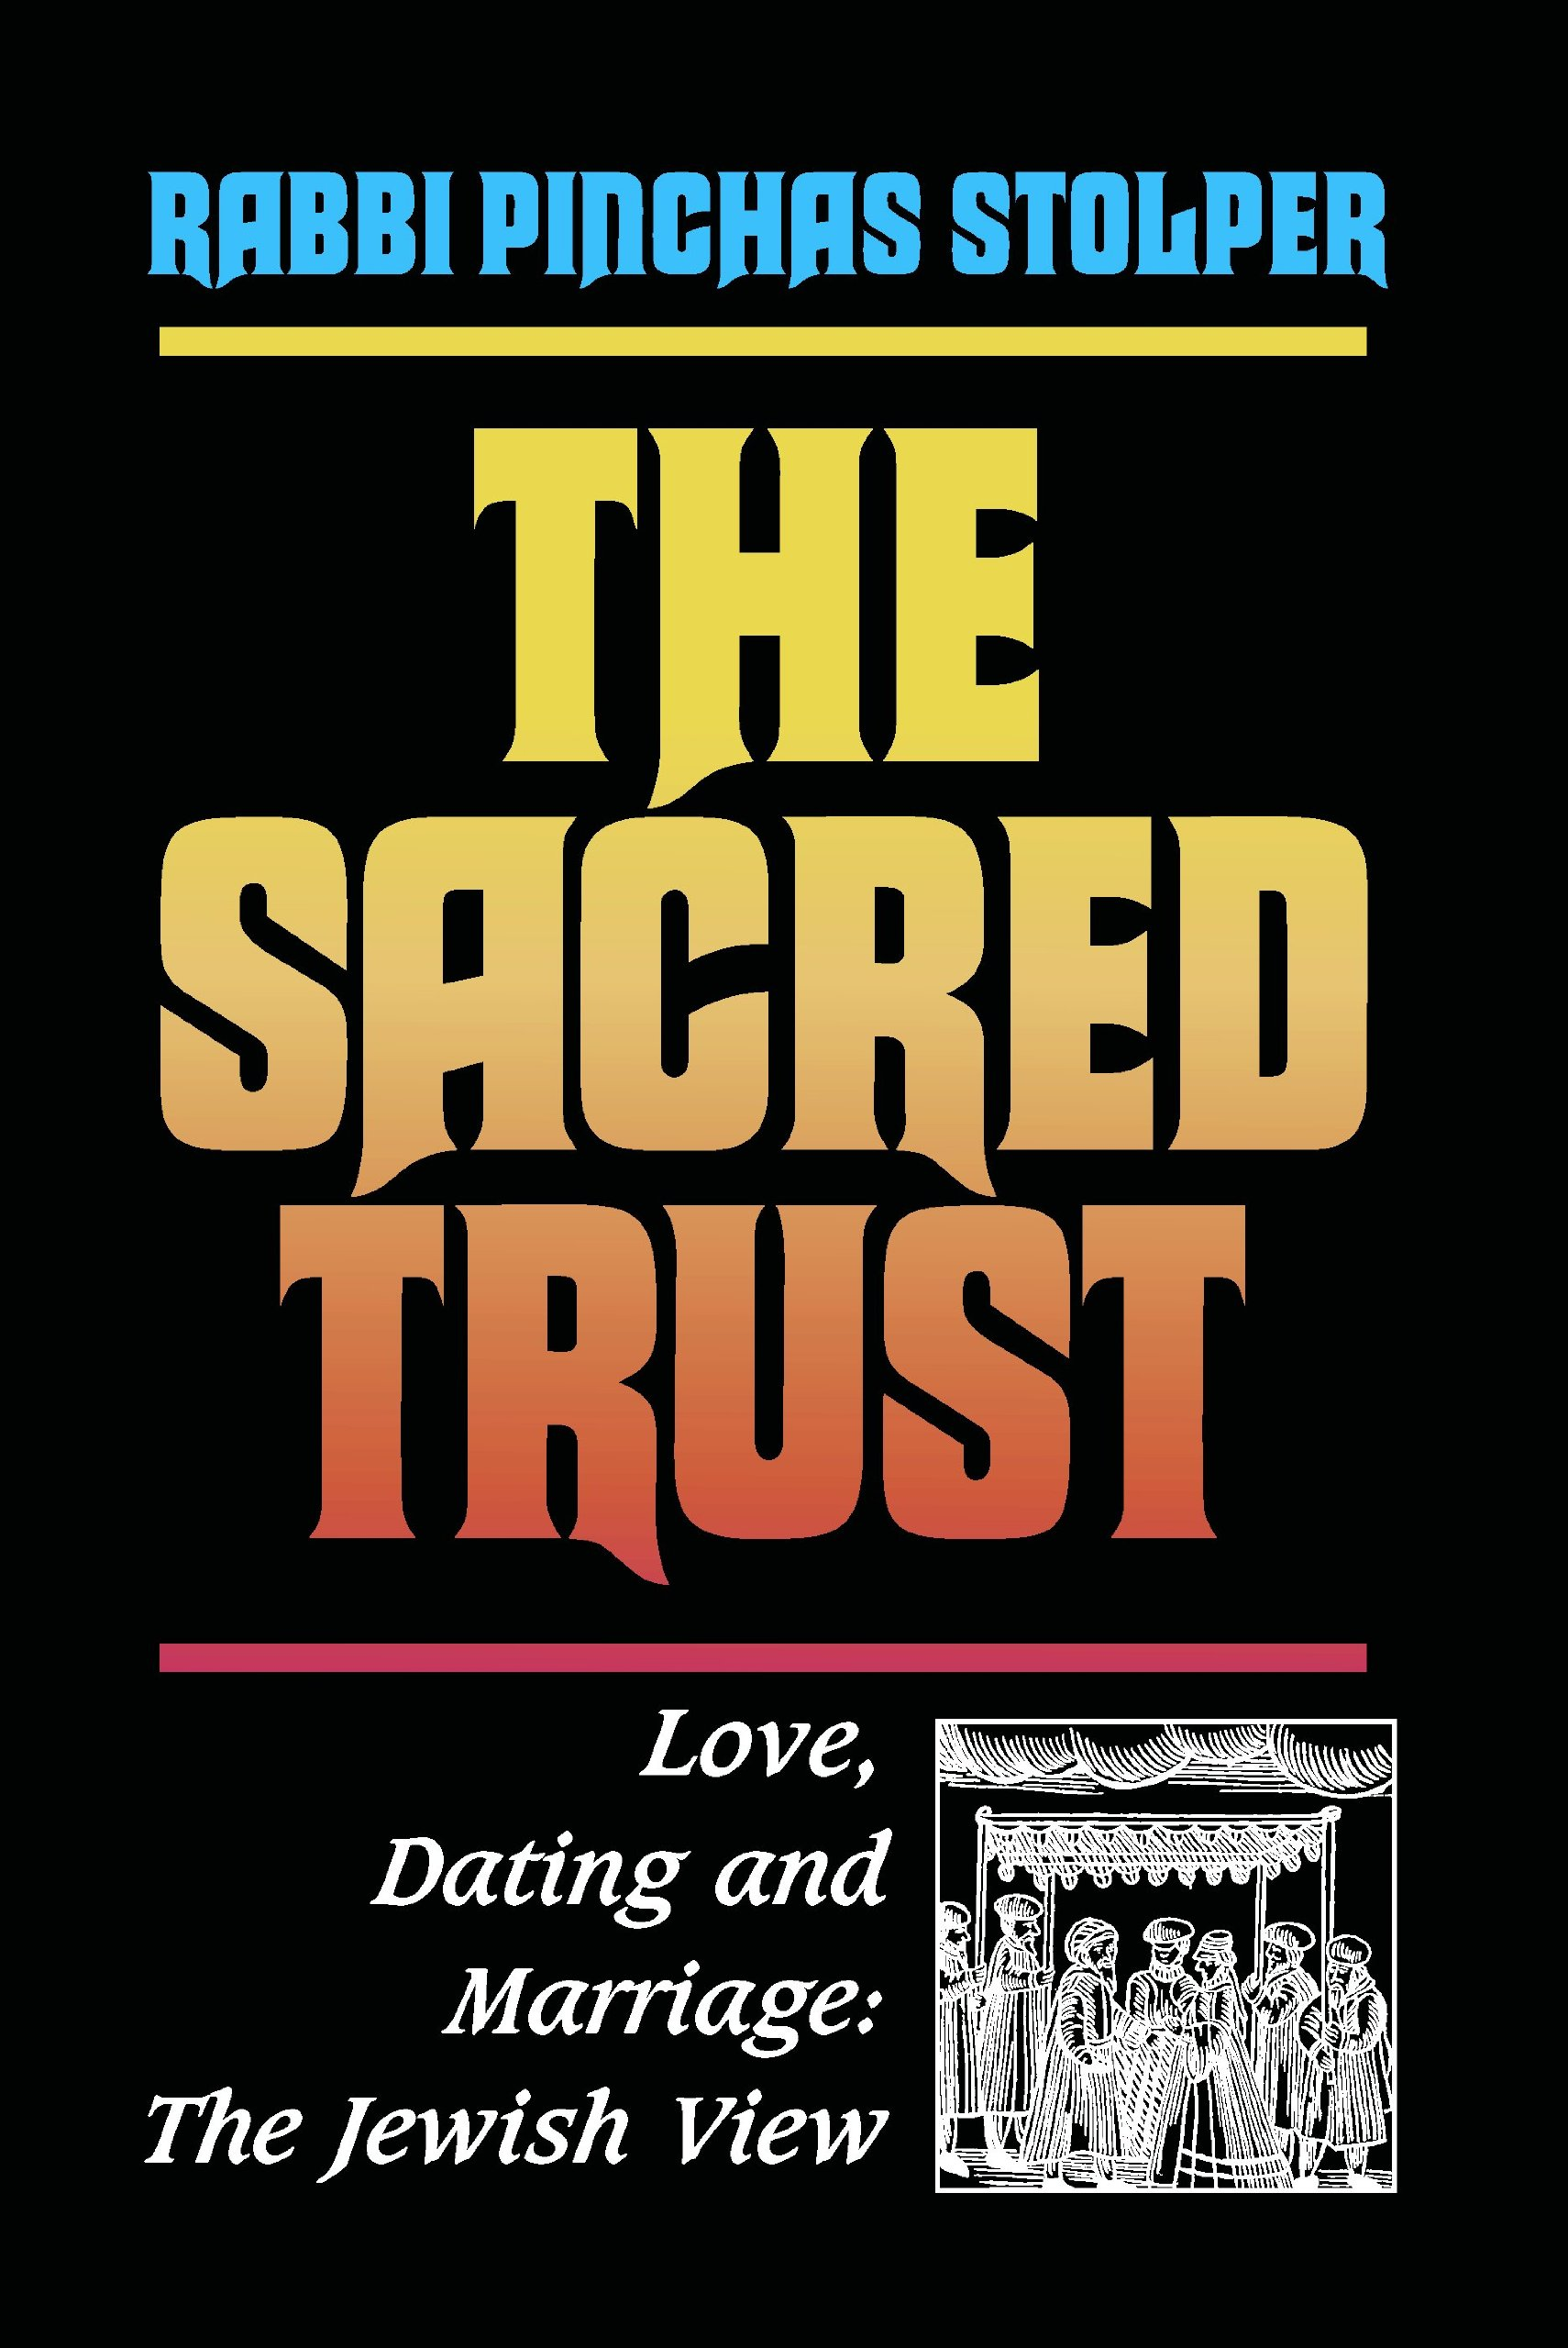 Jewish view of dating